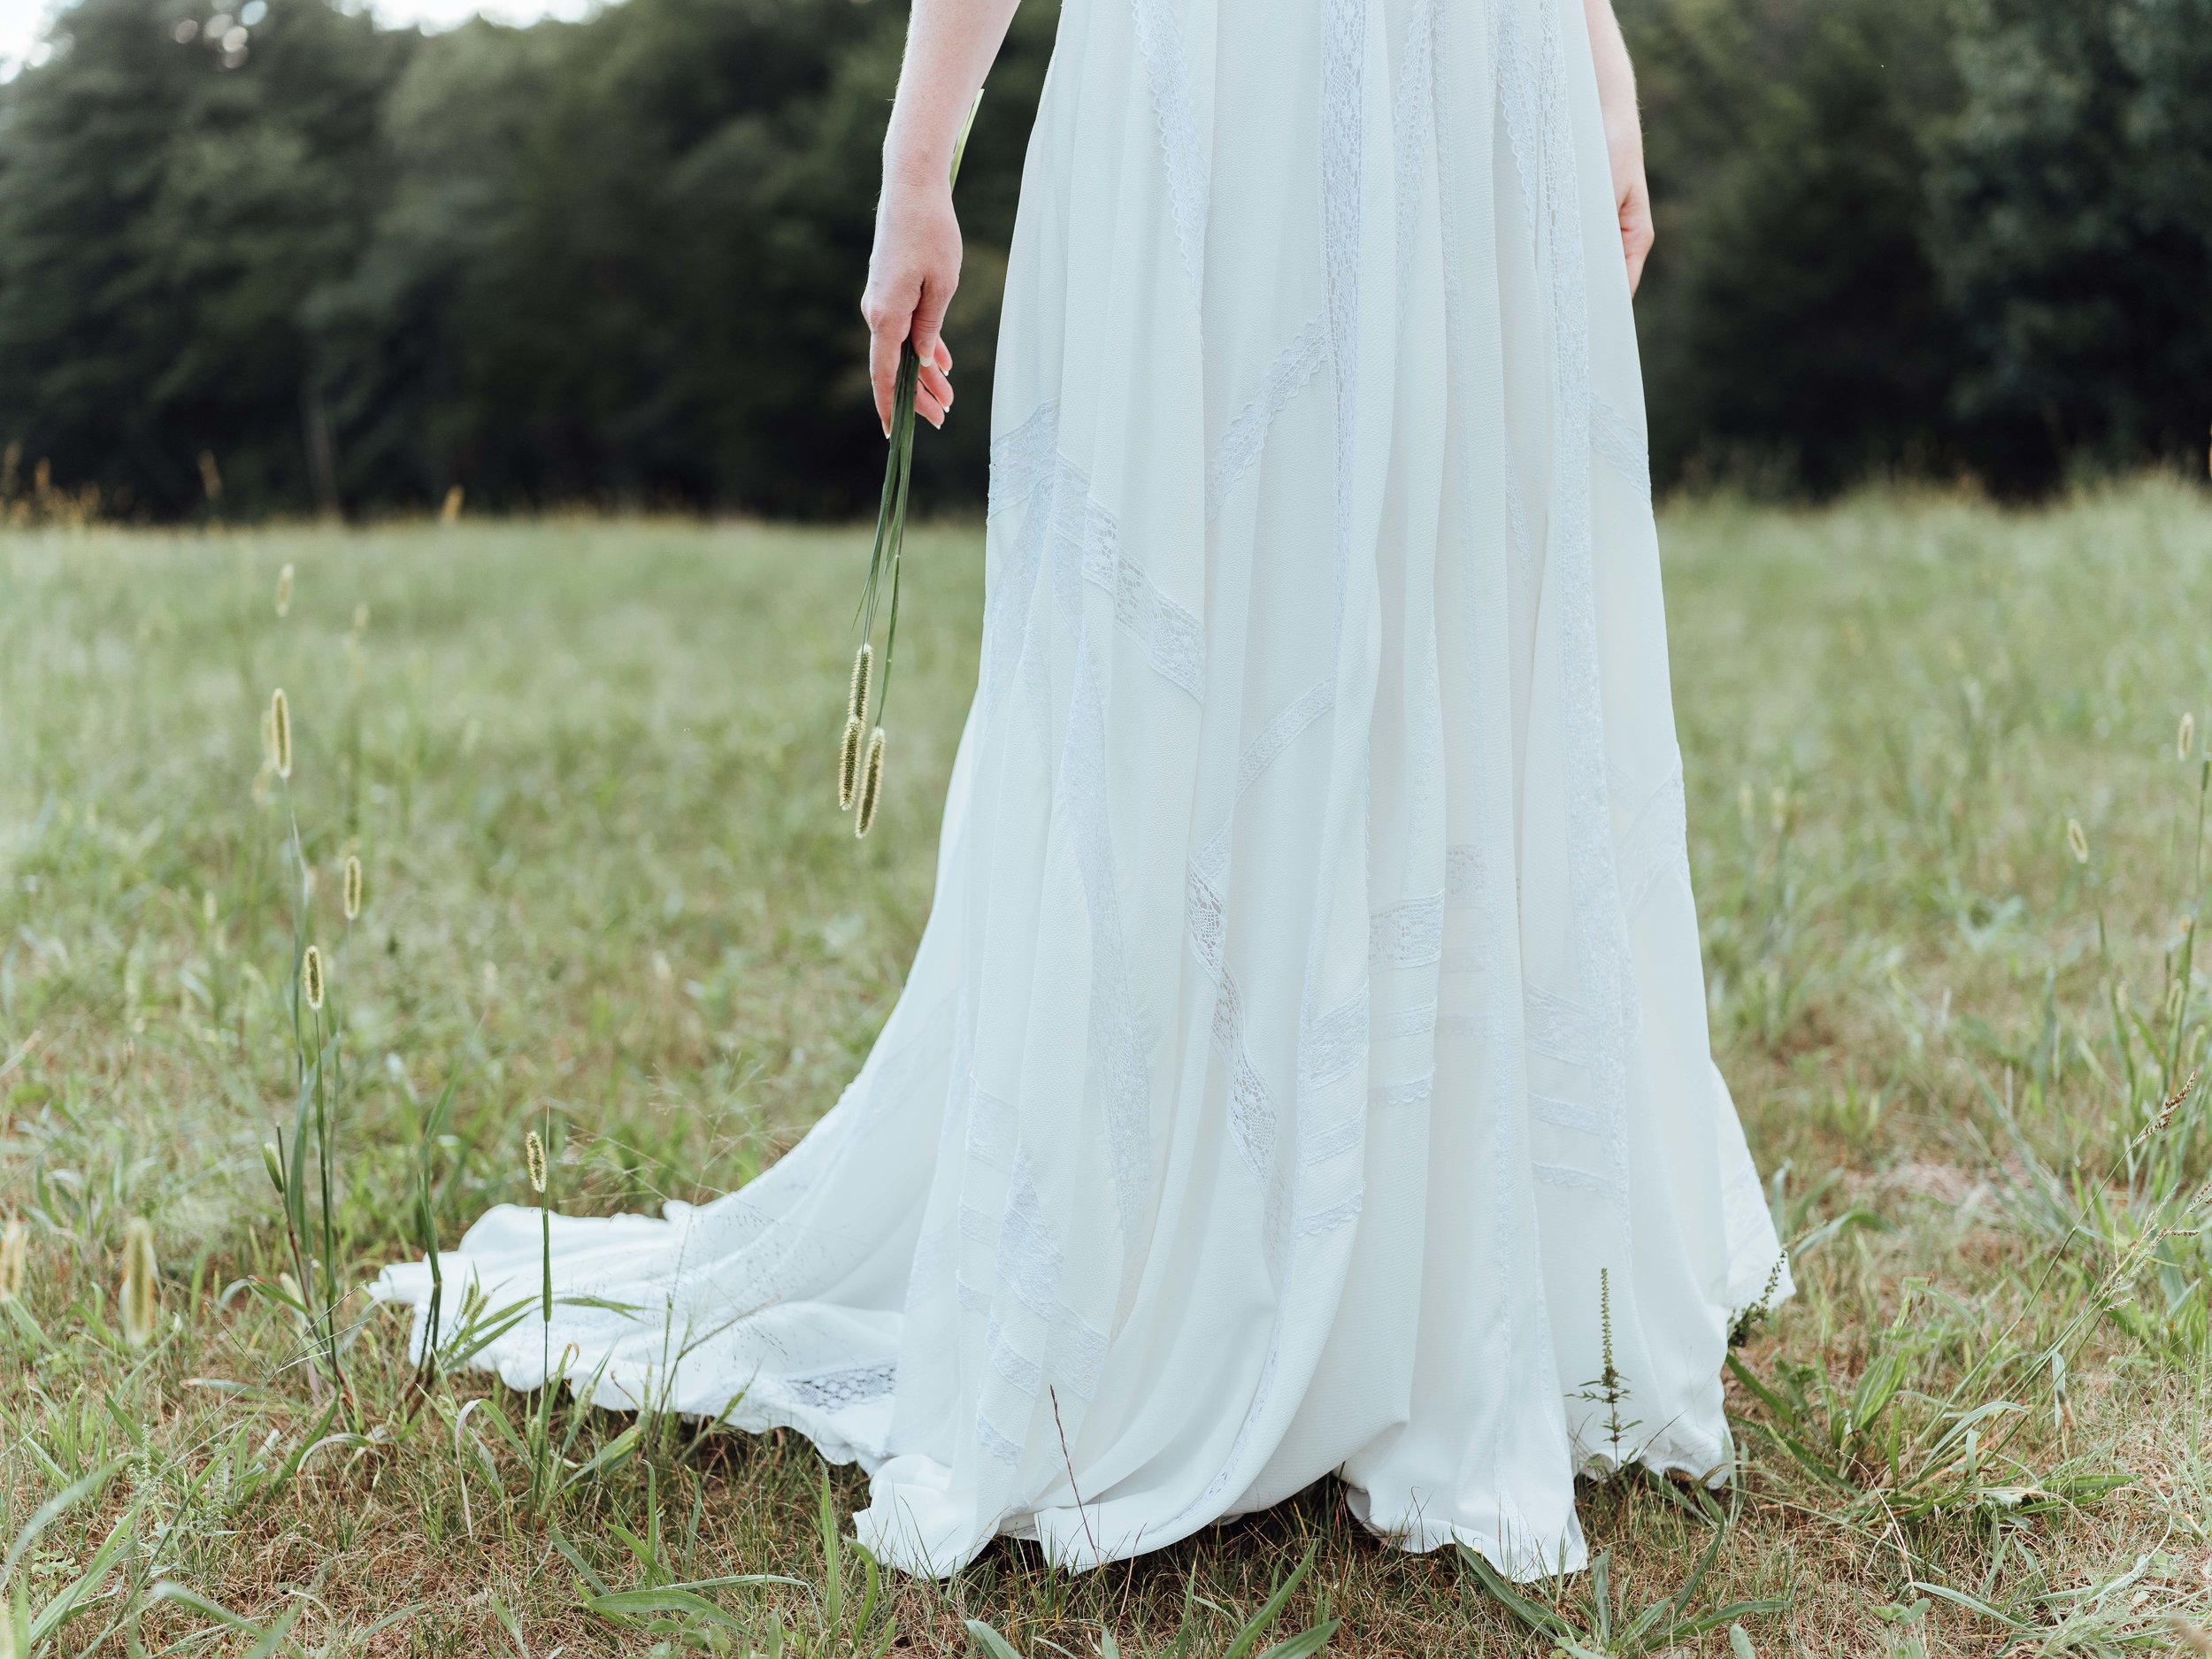 WSPCo-Gather-Greene-Rebecca-Schoneveld-Bridal-210 copy.jpg